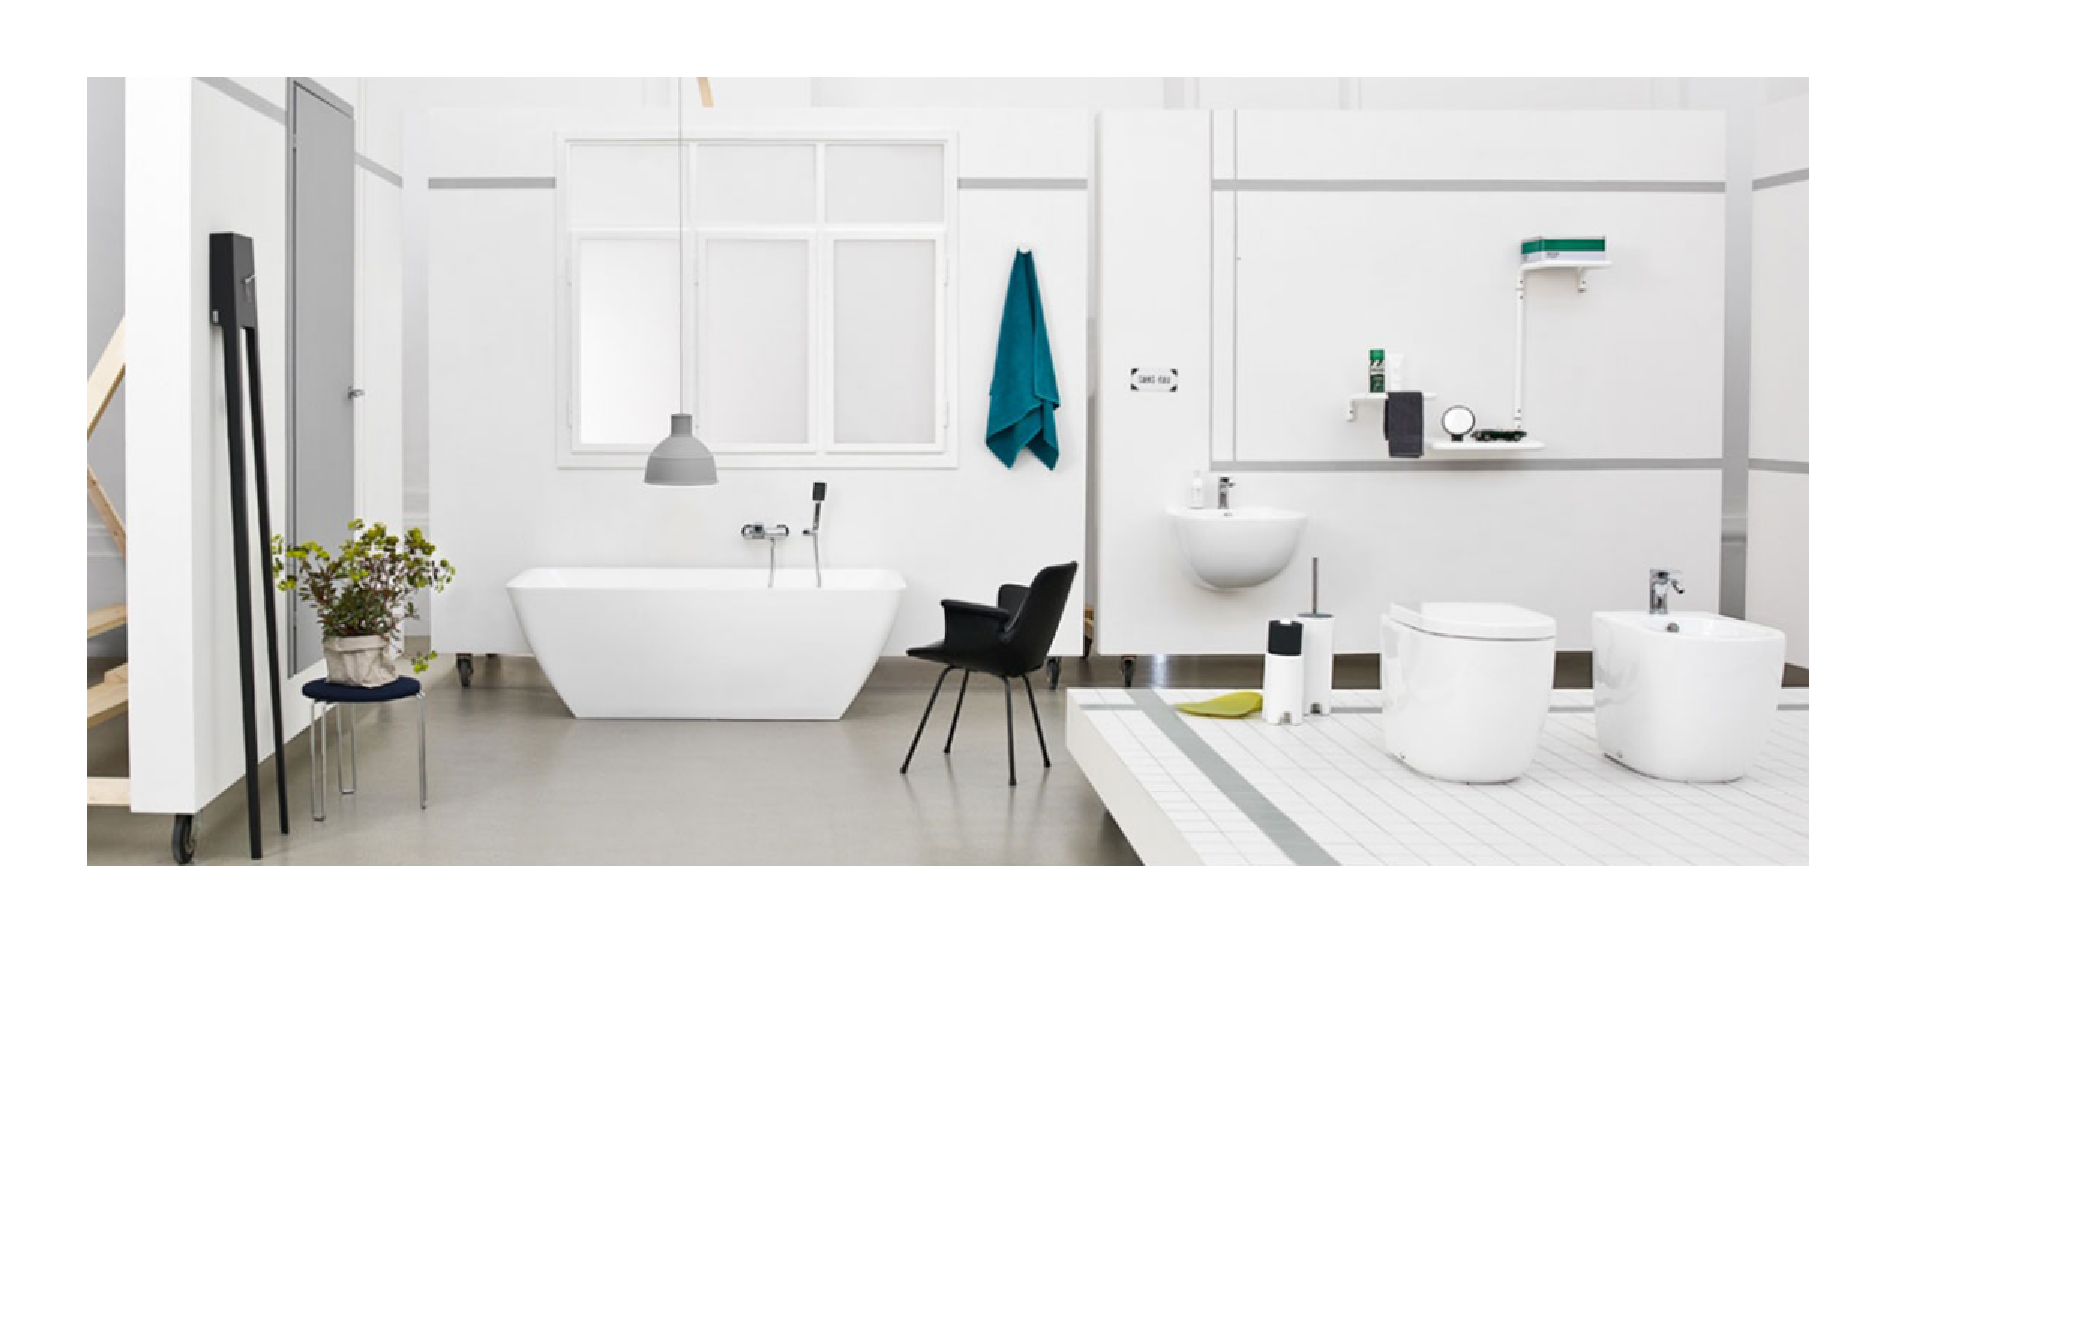 Sanitari da bagno sanitari bidet filo muro azuley for Sanitari da bagno